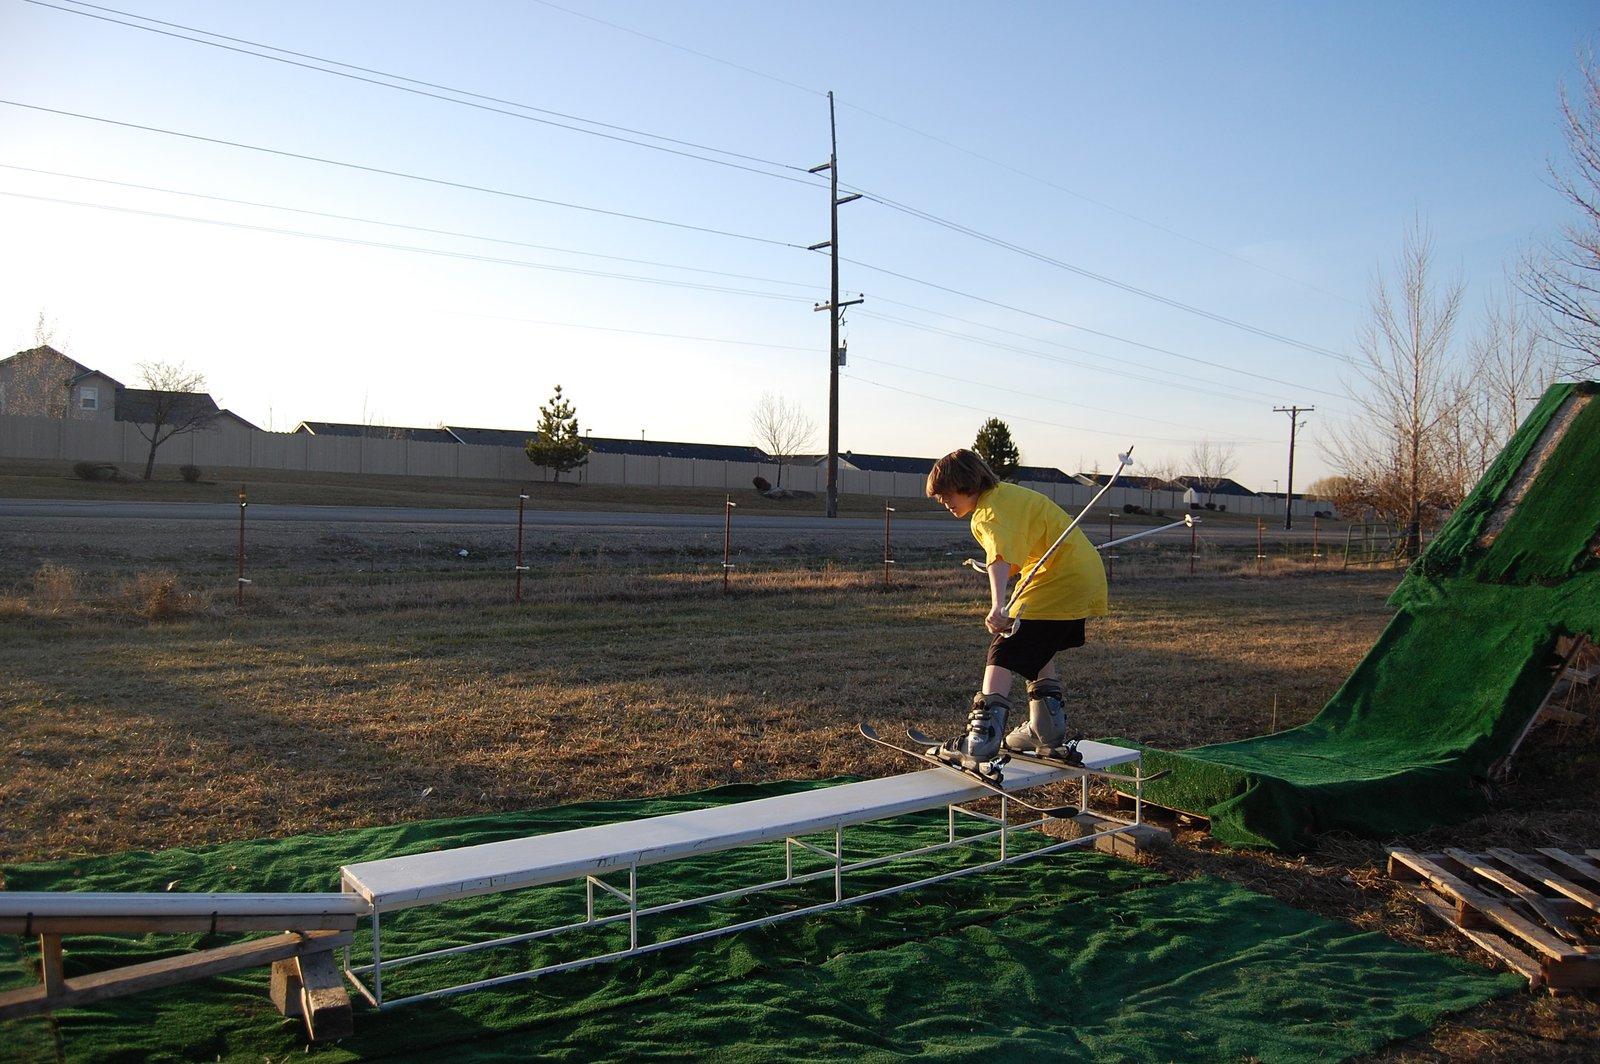 Box to rail on summer jibb